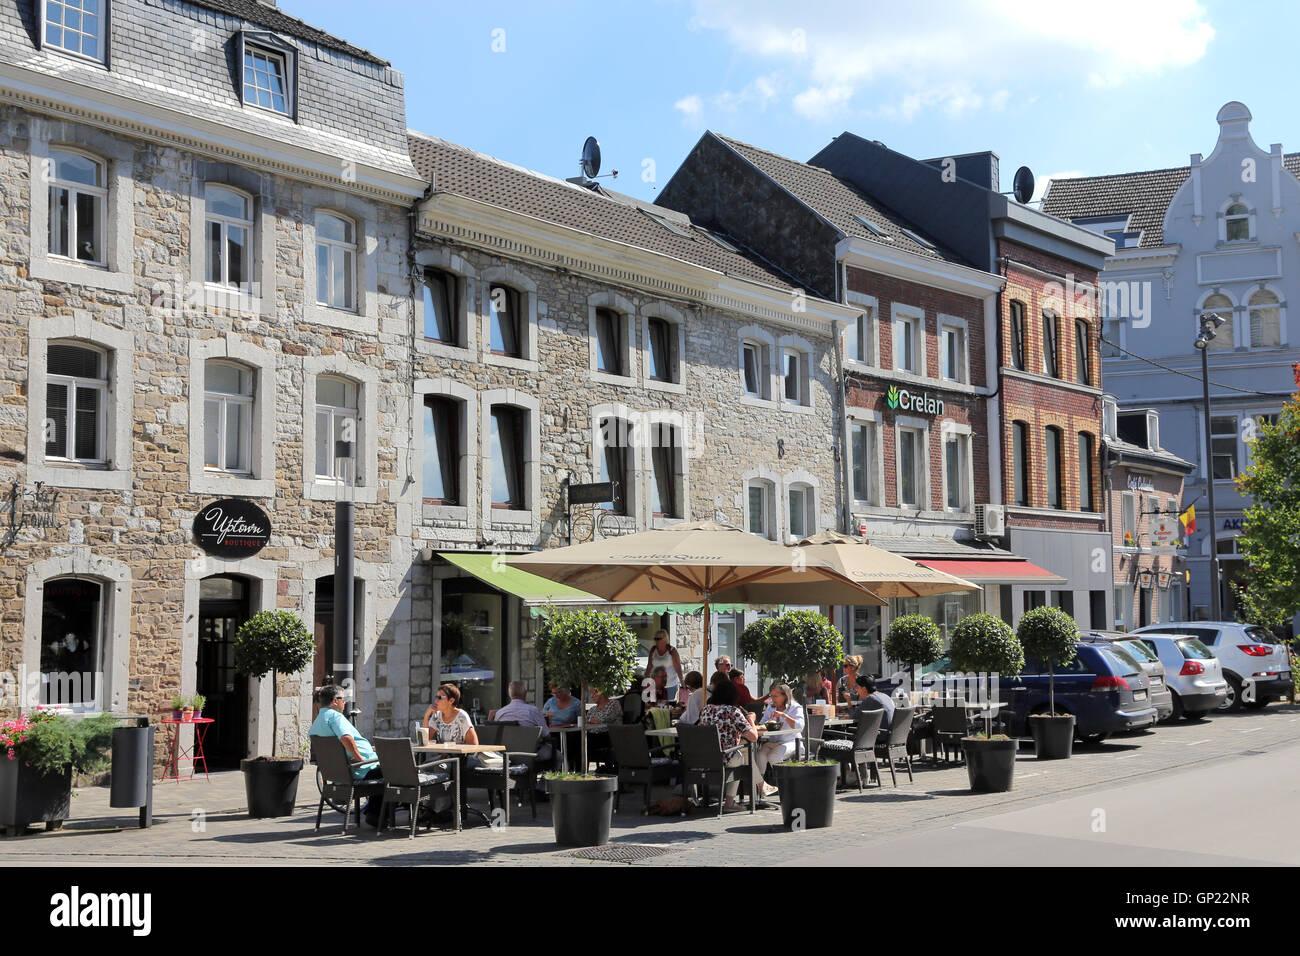 Town houses in the old town of Eupen, Belgium, Capital of the German-speaking Community in Belgium. Stock Photo